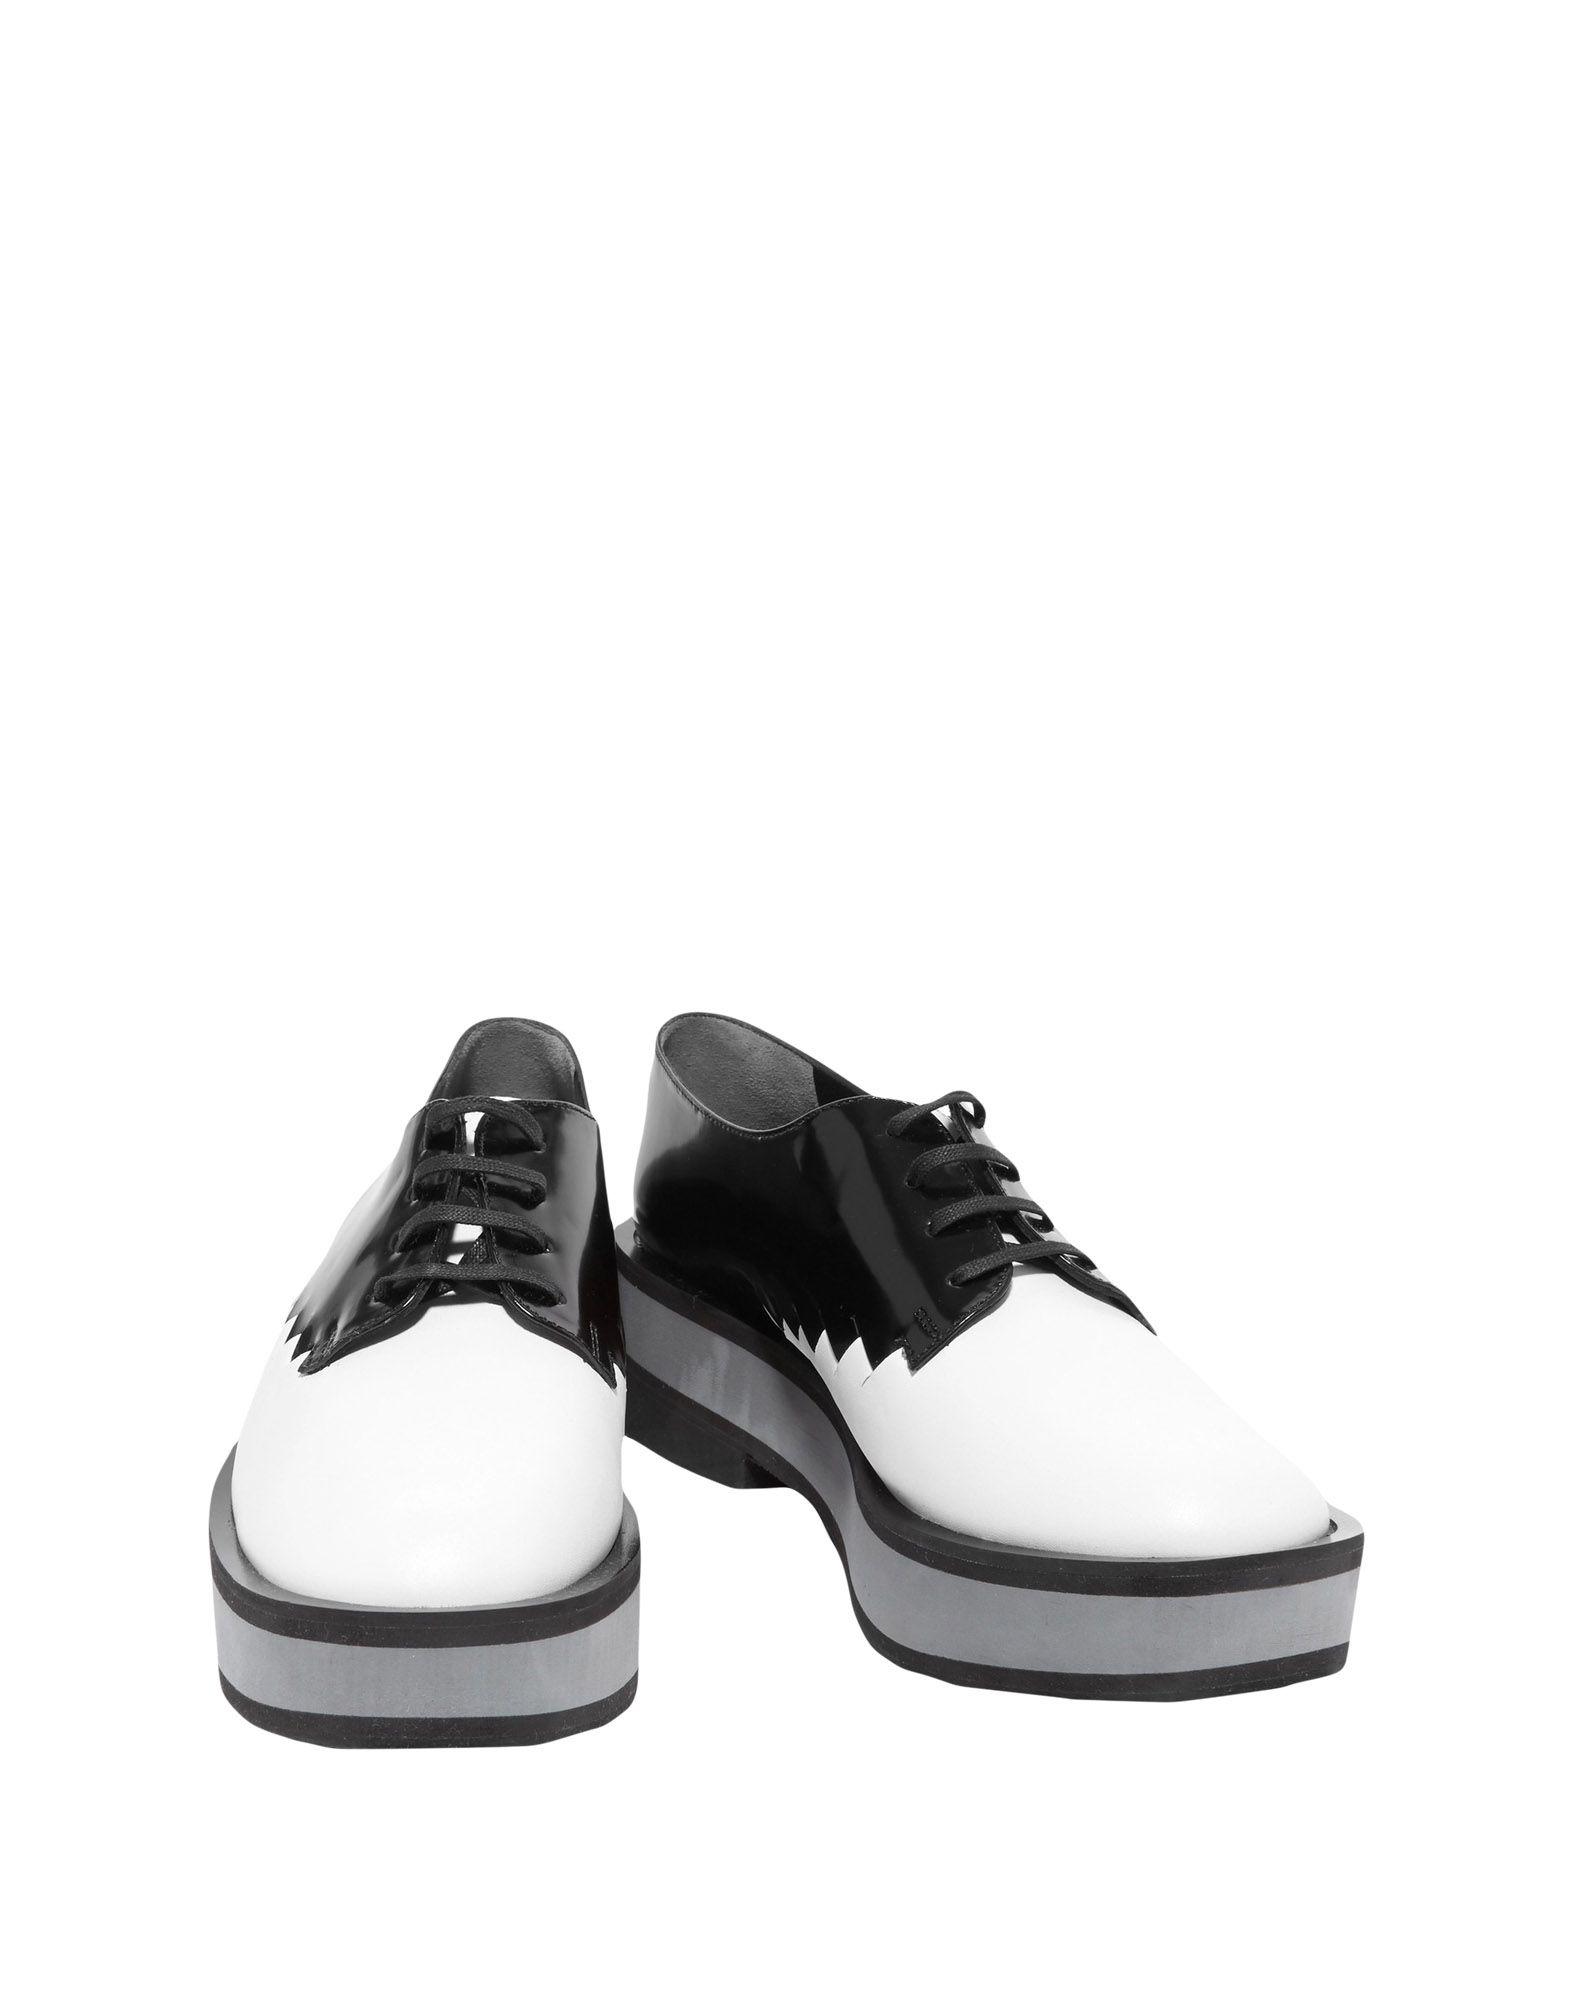 Stilvolle billige Schuhe Robert Clergerie Schnürschuhe Damen 11524287DP